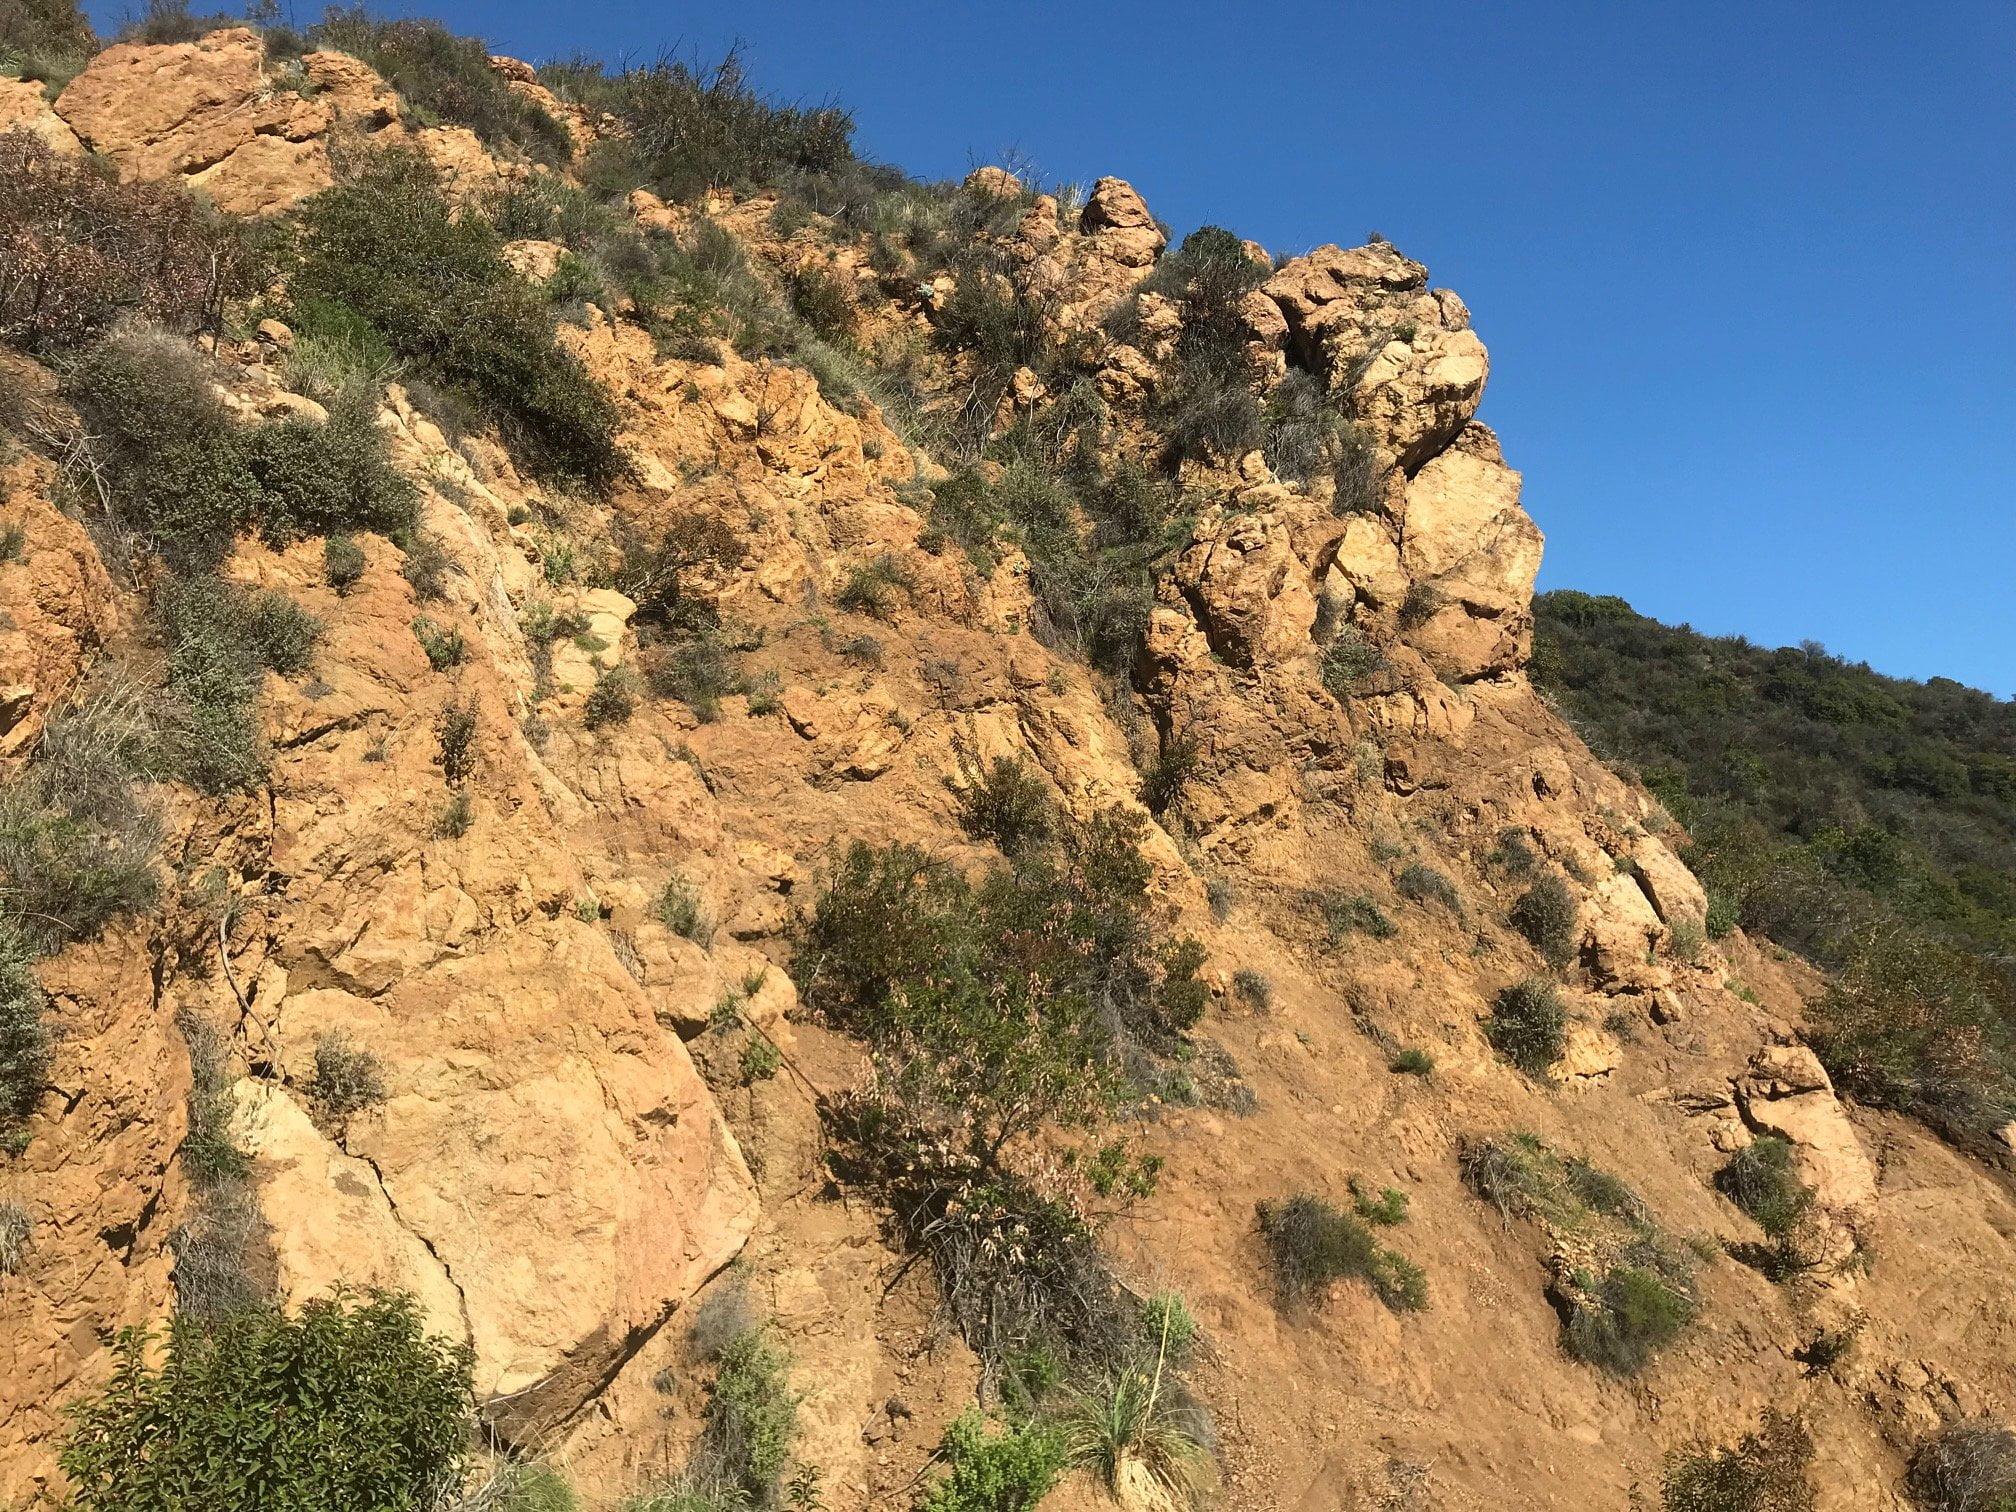 Escondido Falls canyon rocks